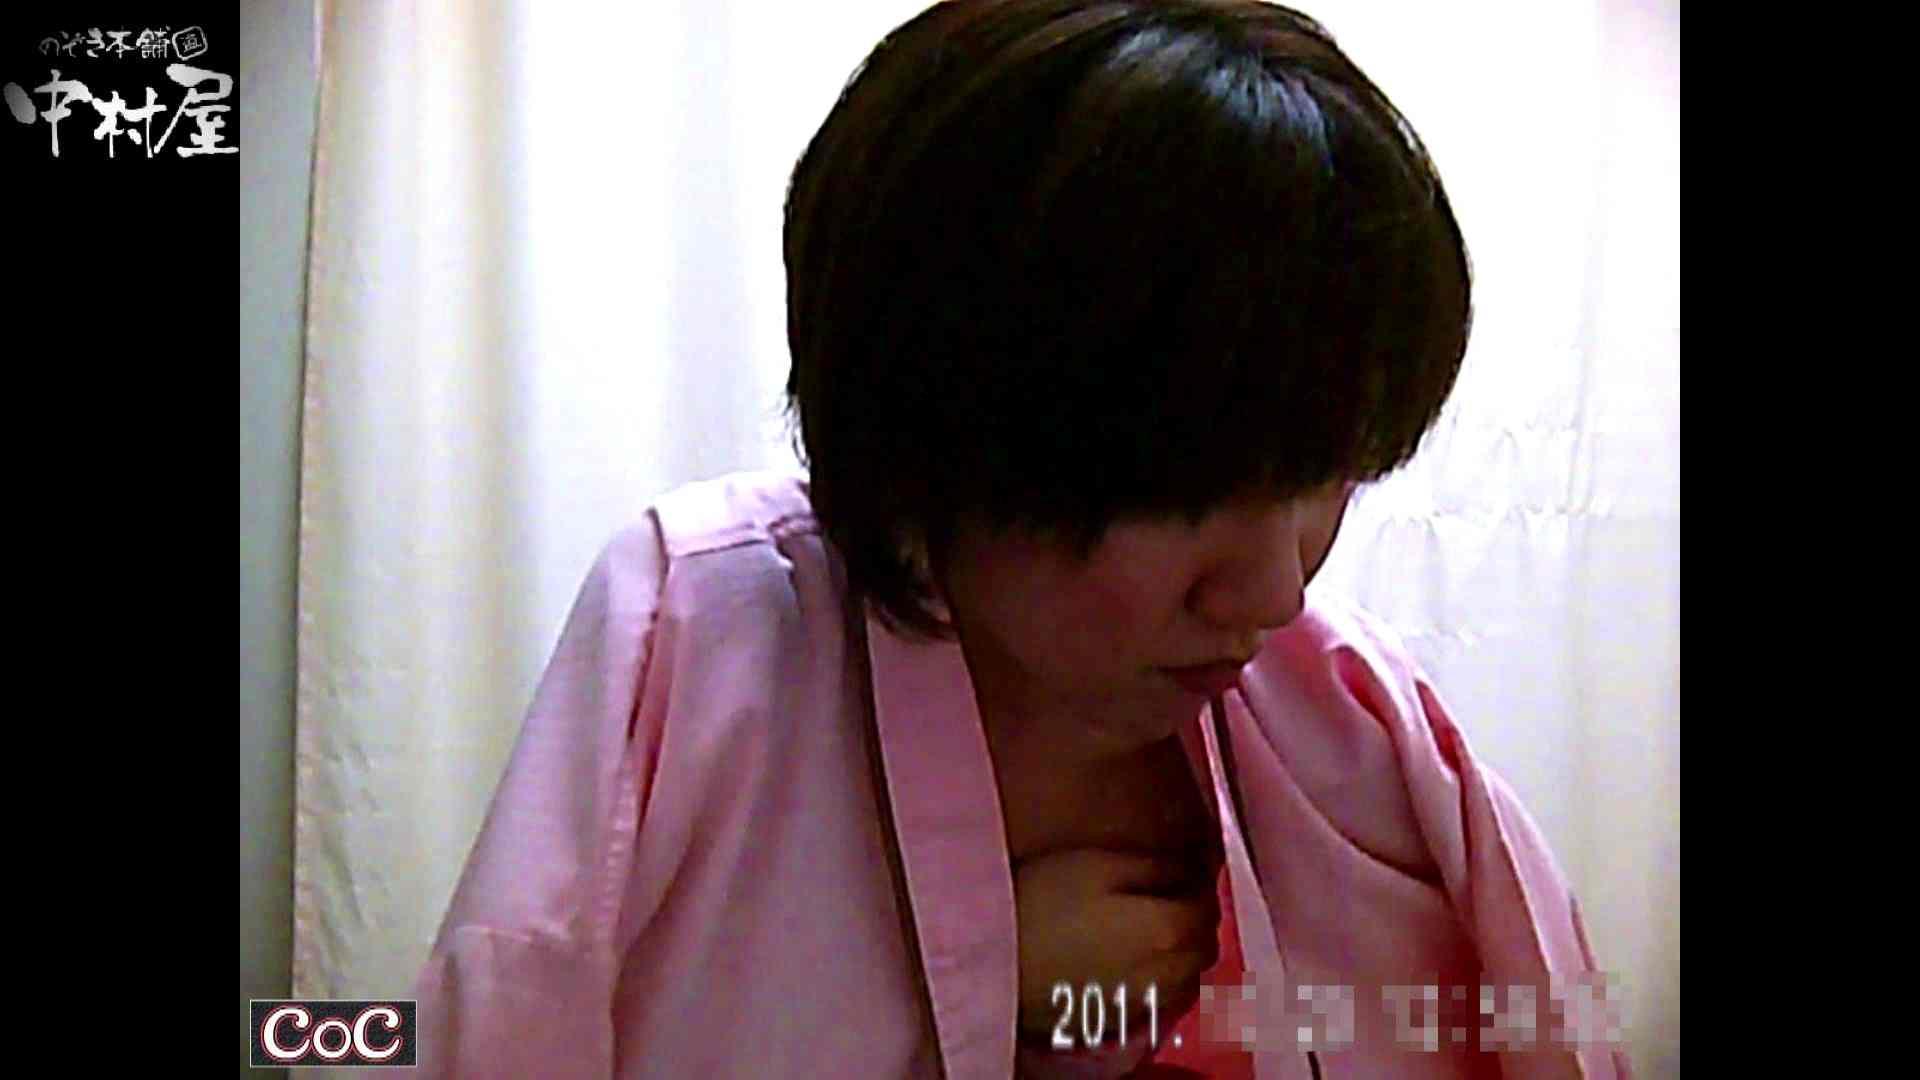 Doctor-X元医者による反抗vol.65 おまんこ見放題 | 盗撮シリーズ  102PIX 53